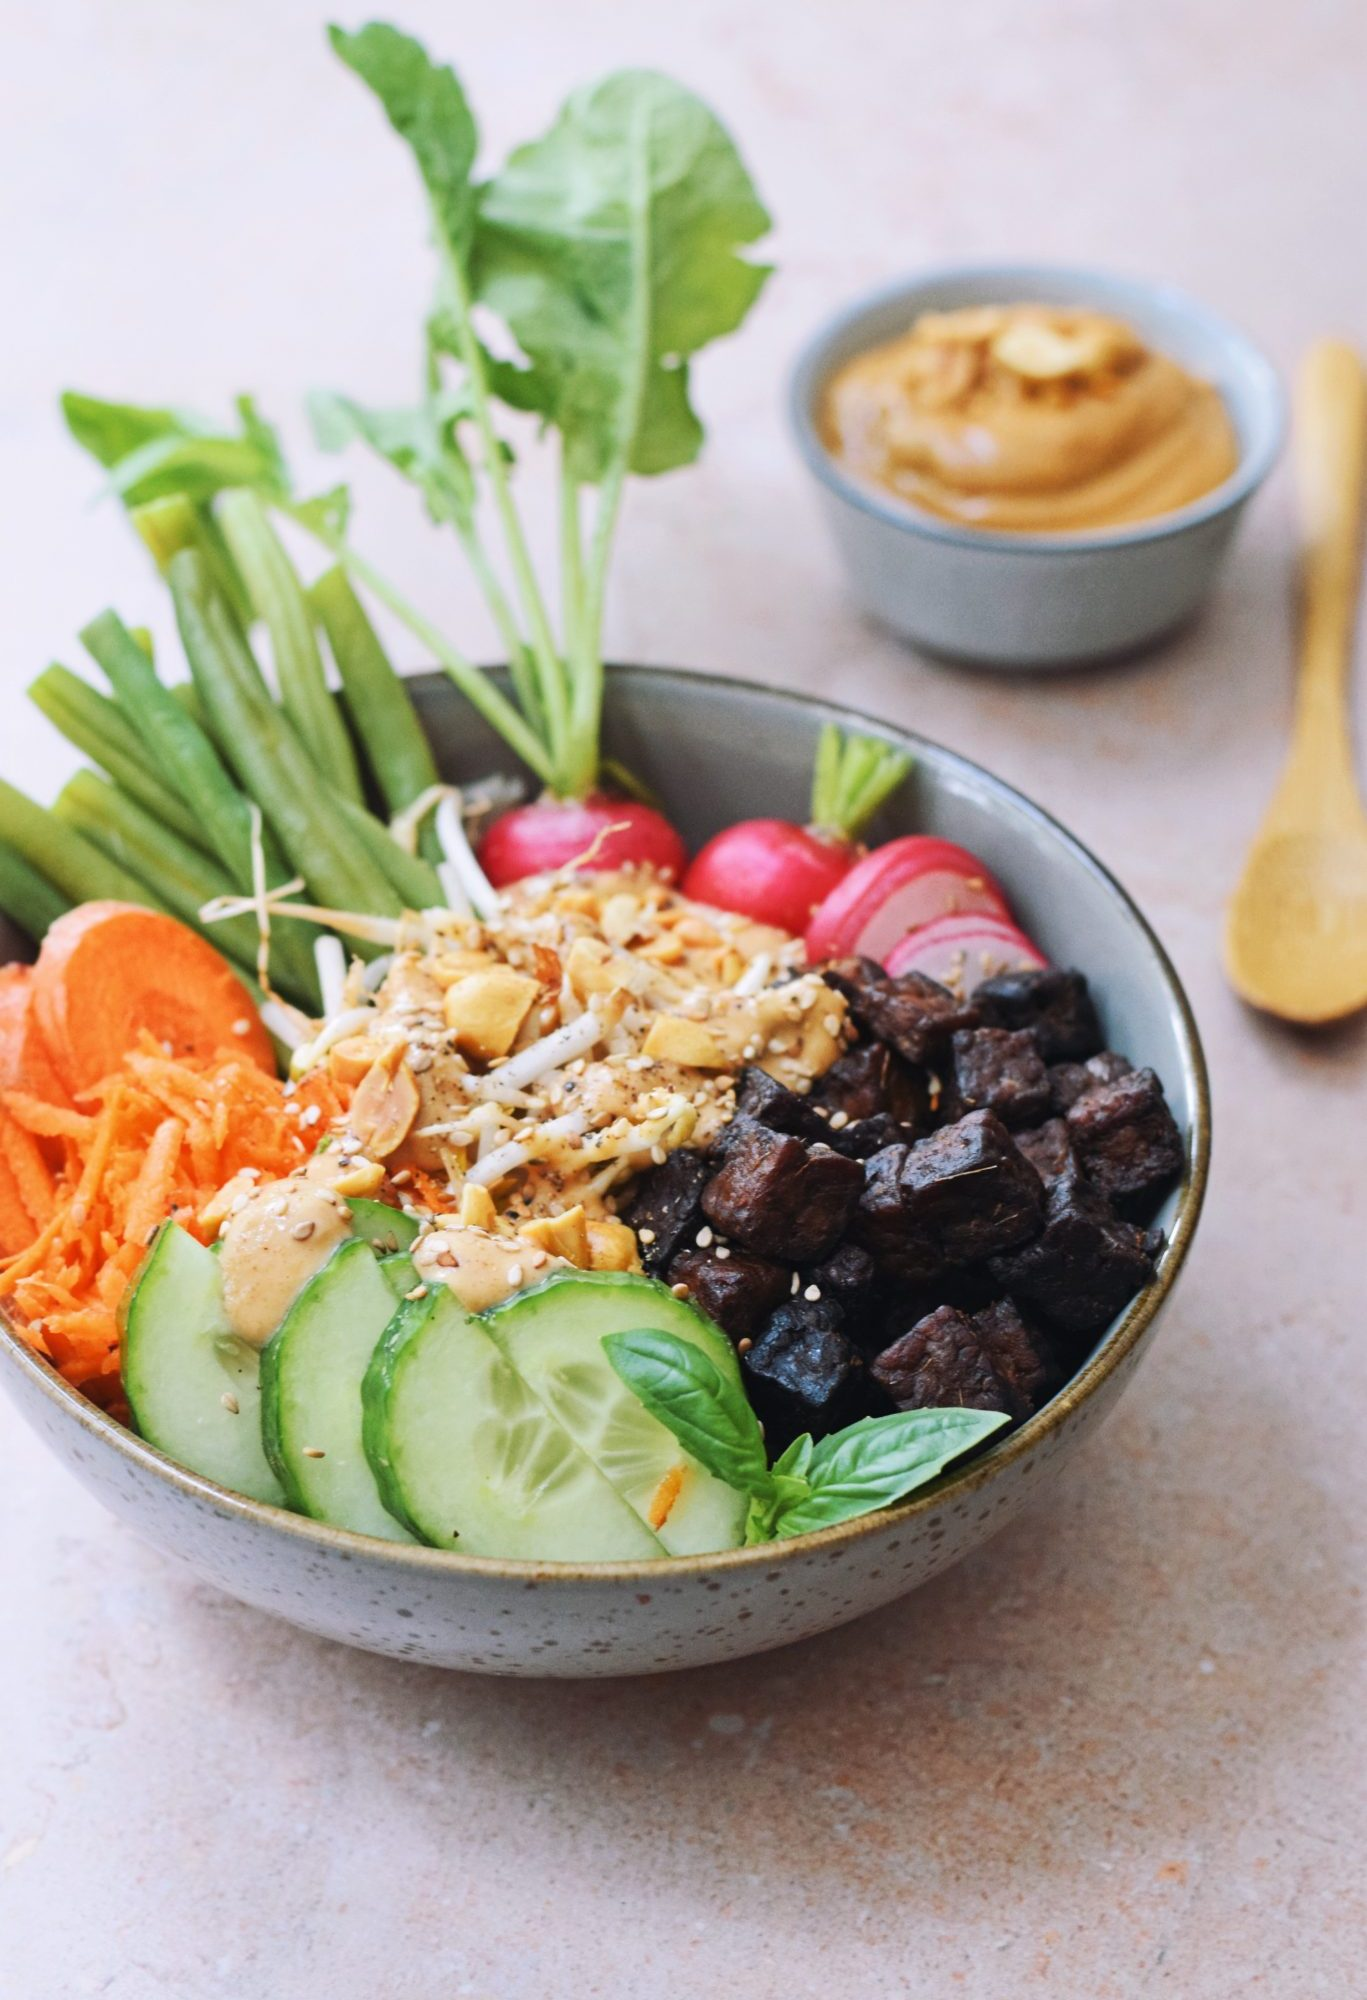 Vegan gado gado recept | Met lupine tempeh